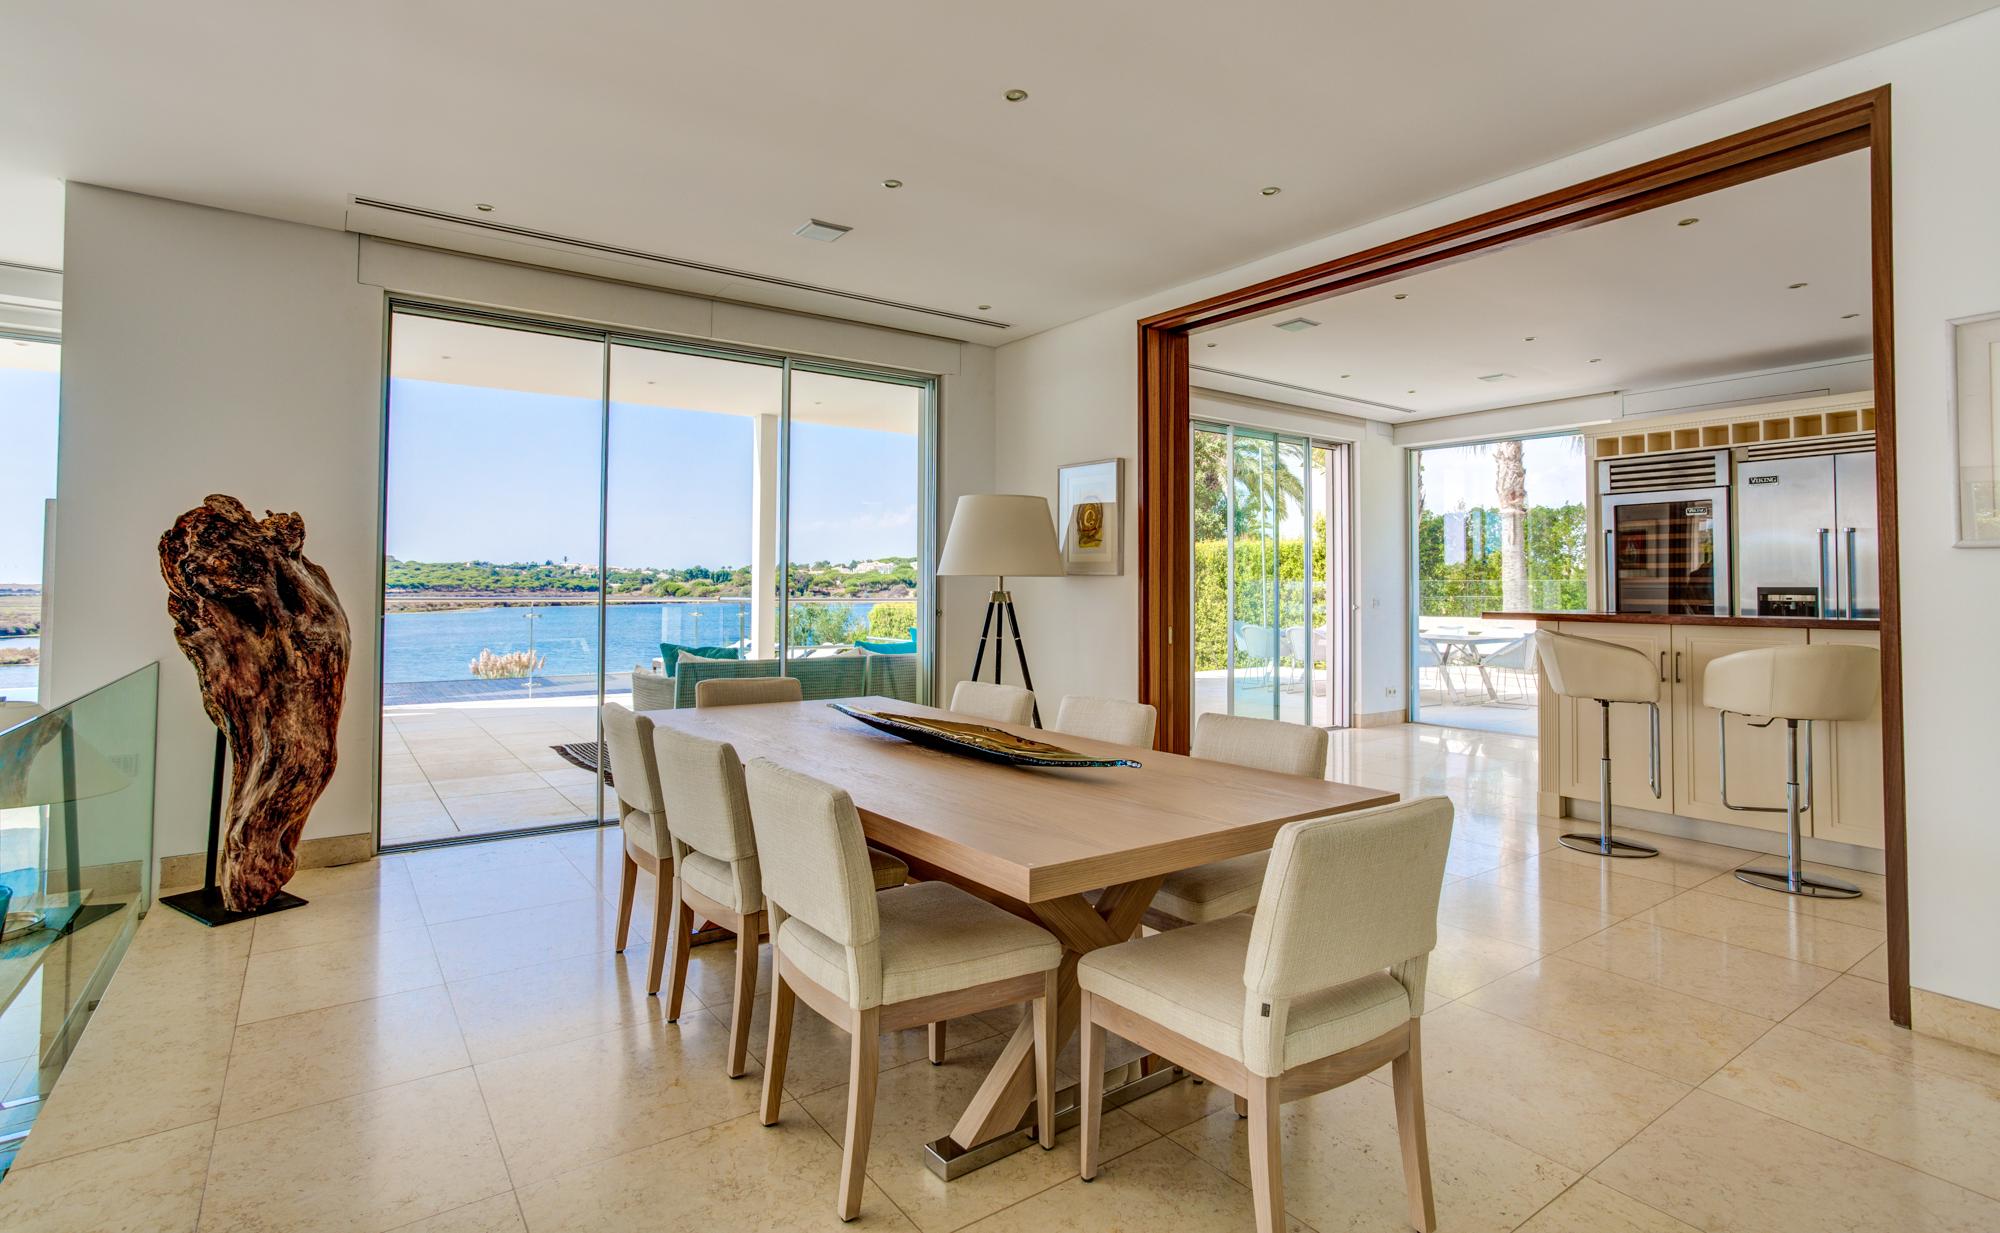 Villa Moon Sone, 5 bedroom prestige villa in Quinta do Lago, Algarve,dining room.jpg